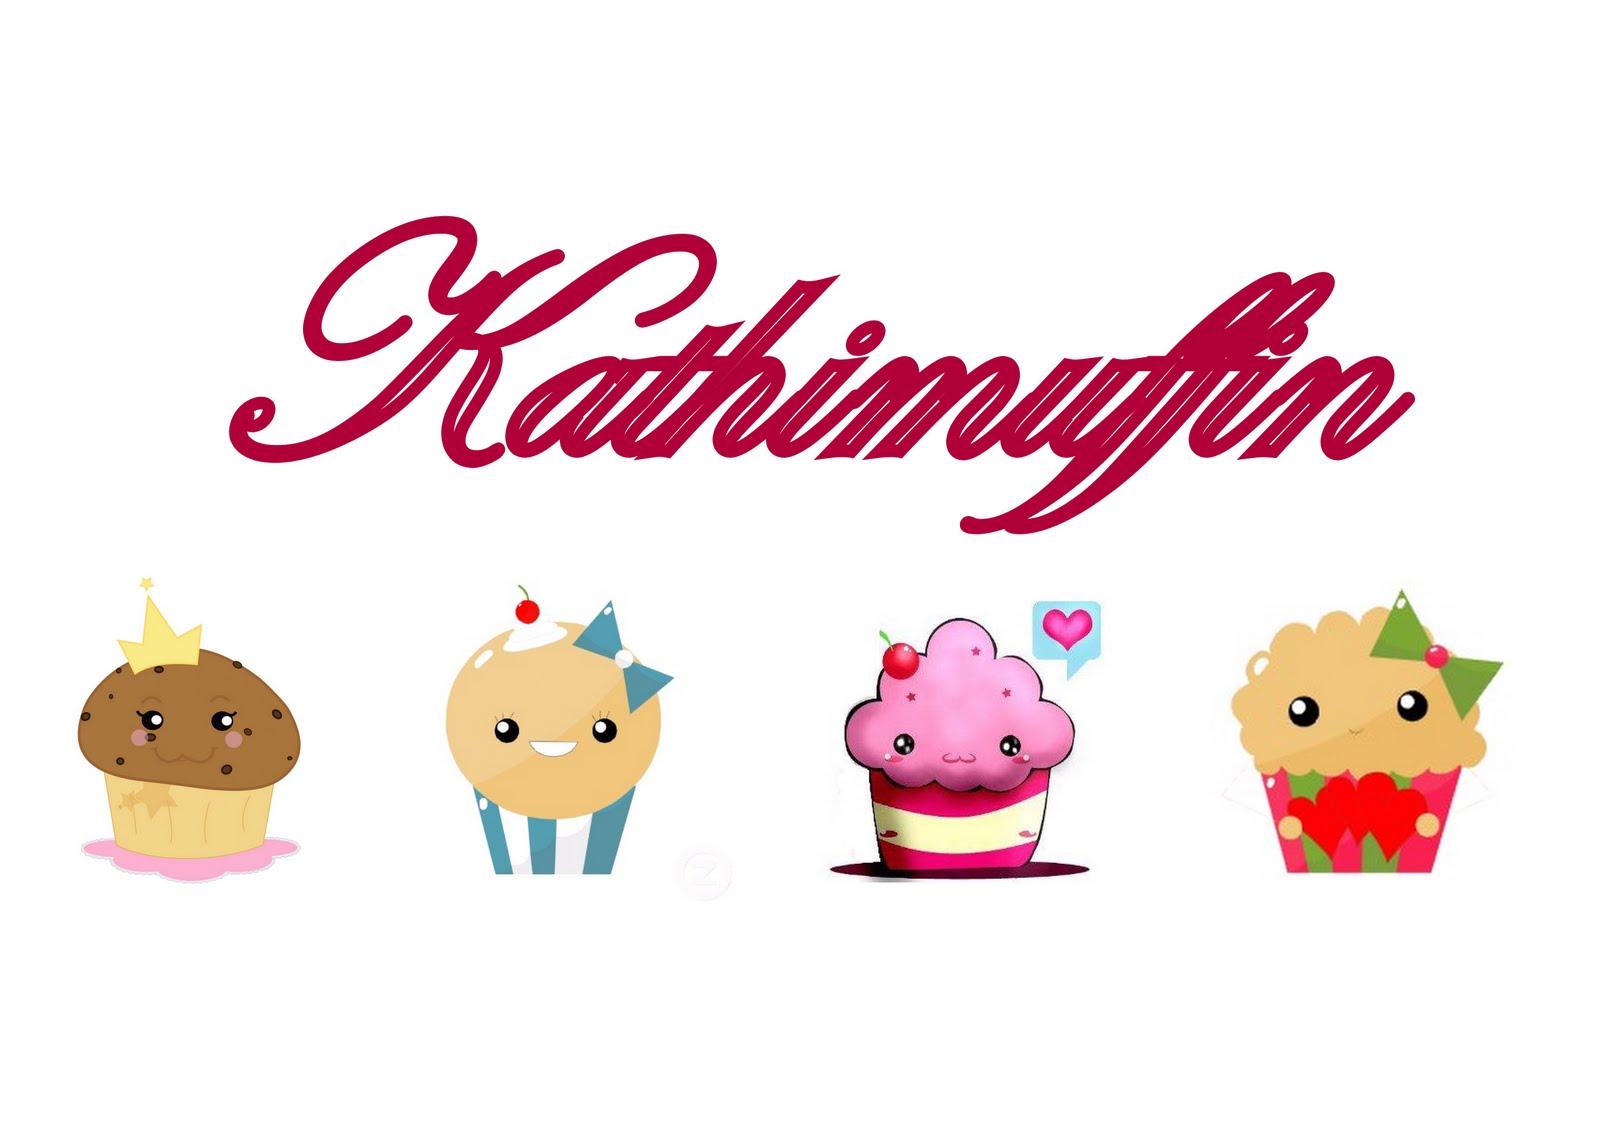 Kathimuffin